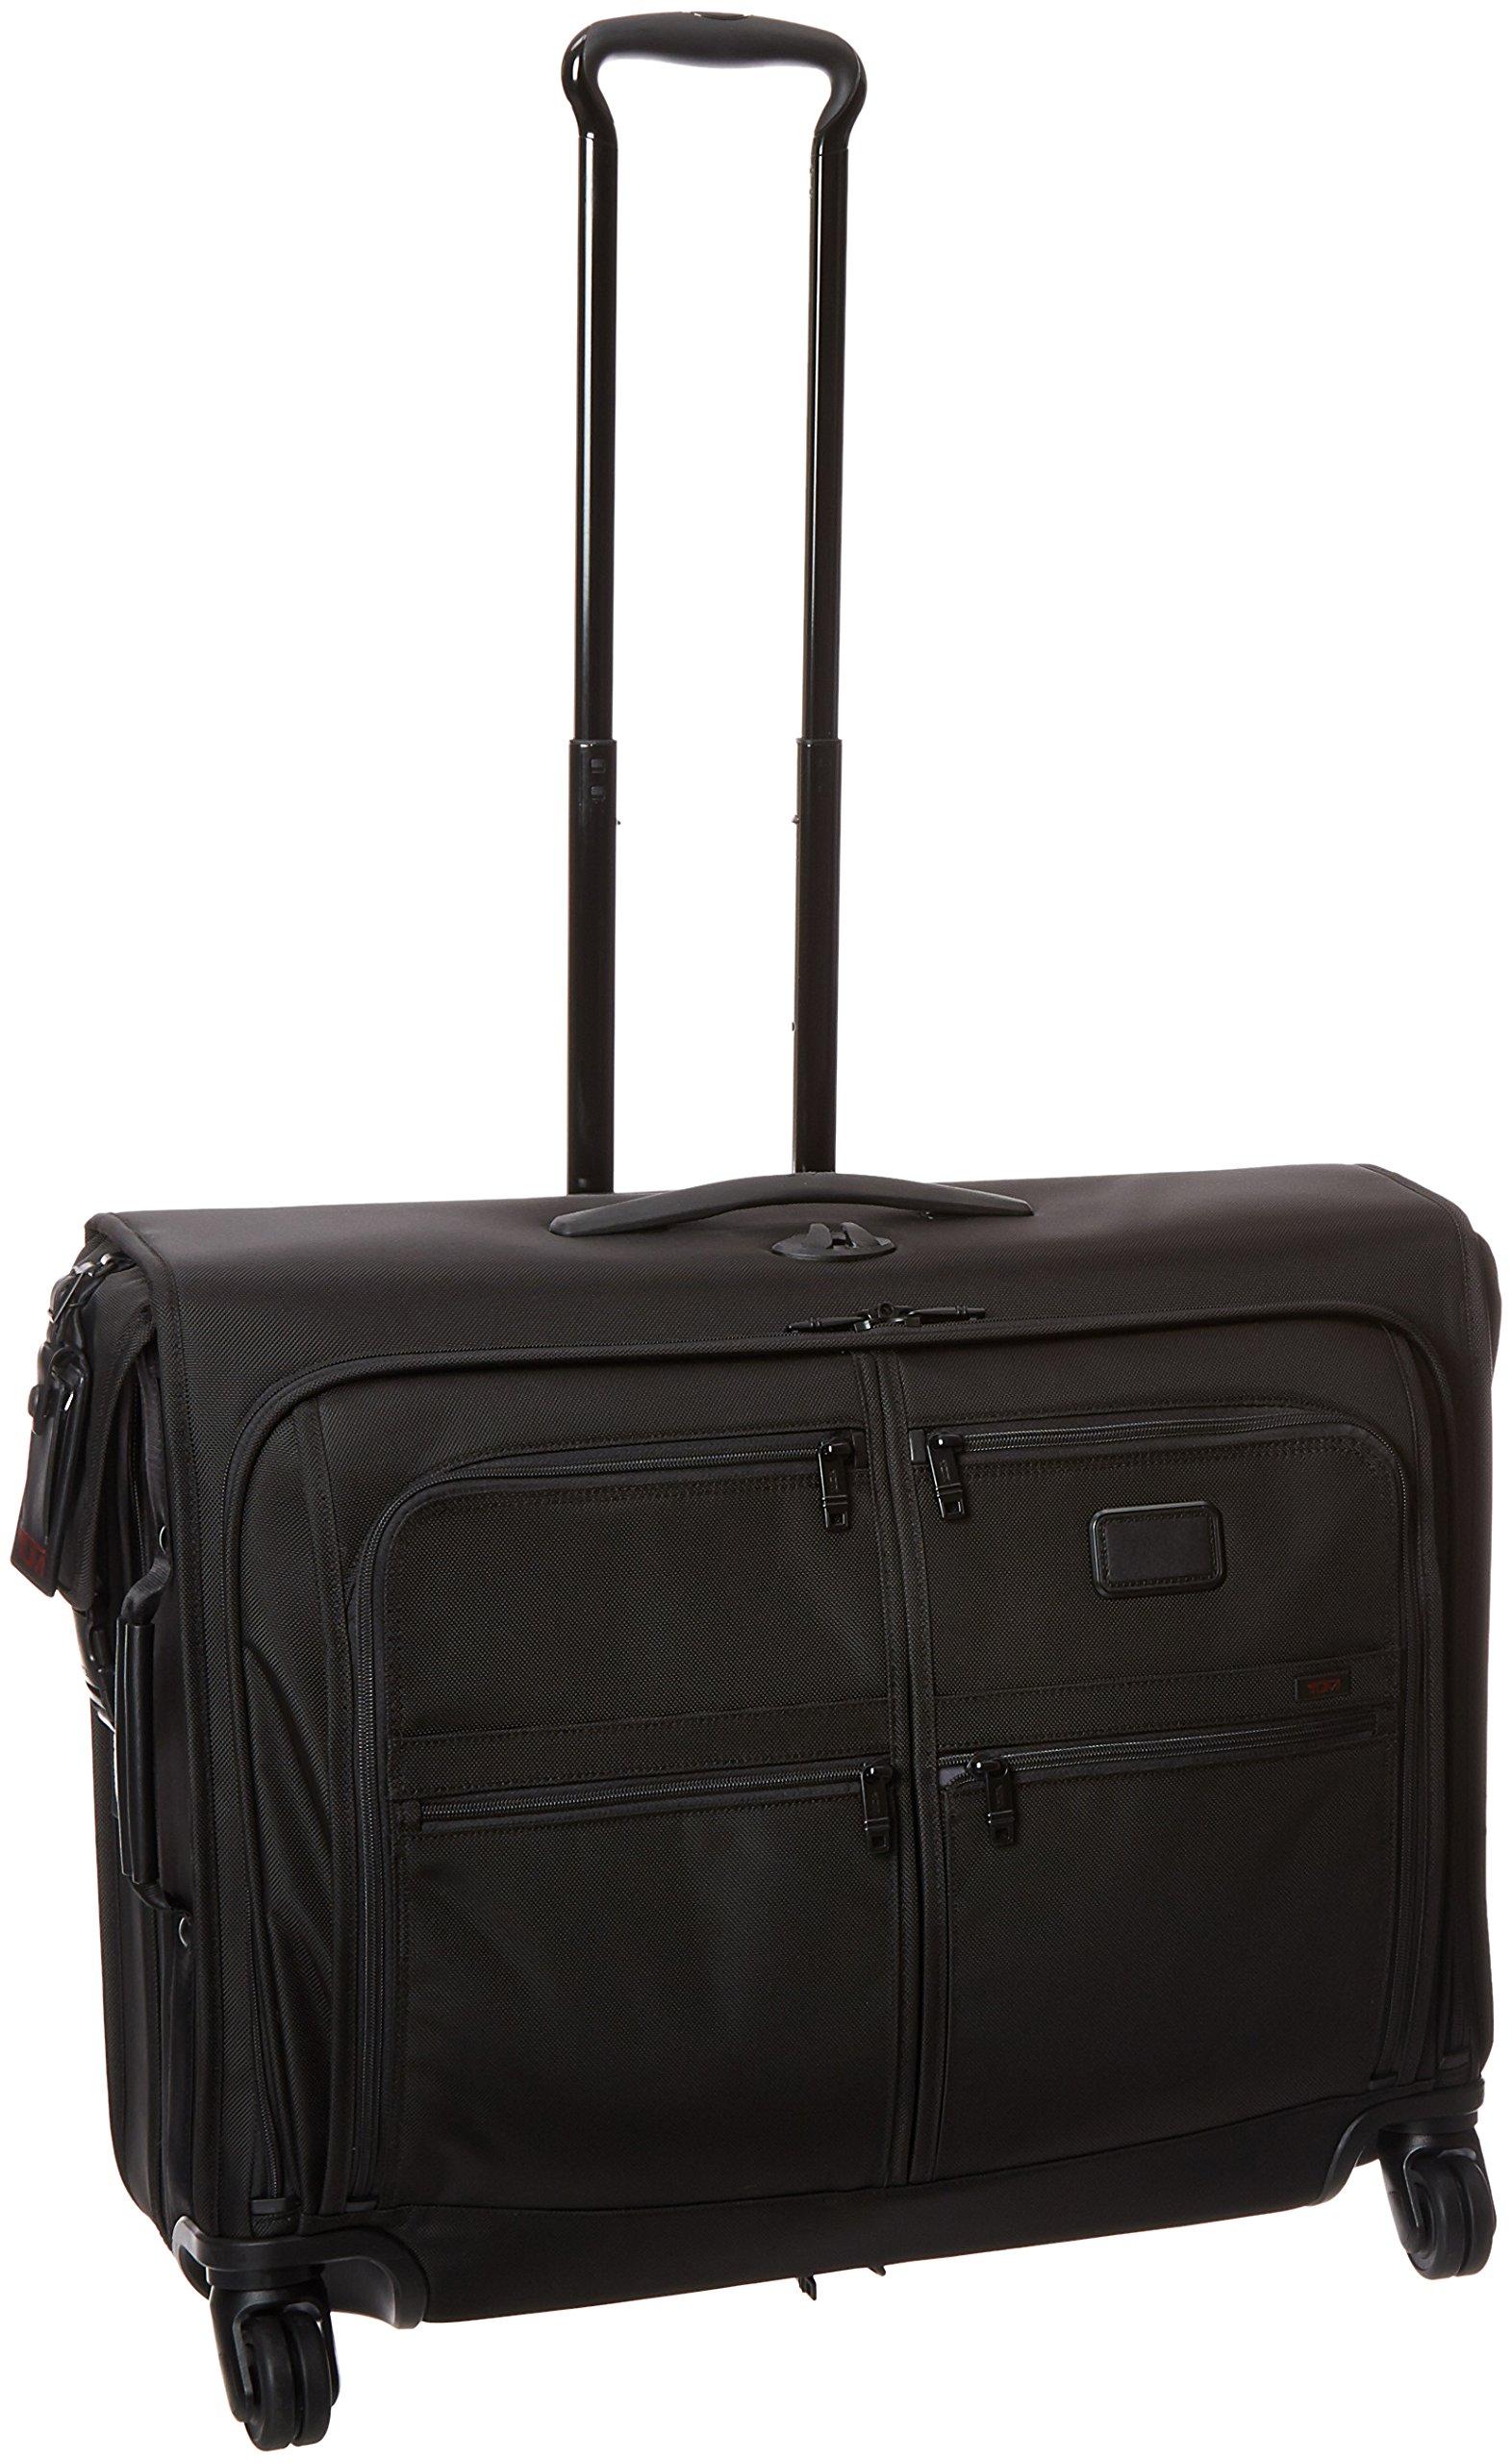 Tumi Alpha 2 4 Wheeled Medium Trip Garment Bag, Black, One Size by Tumi